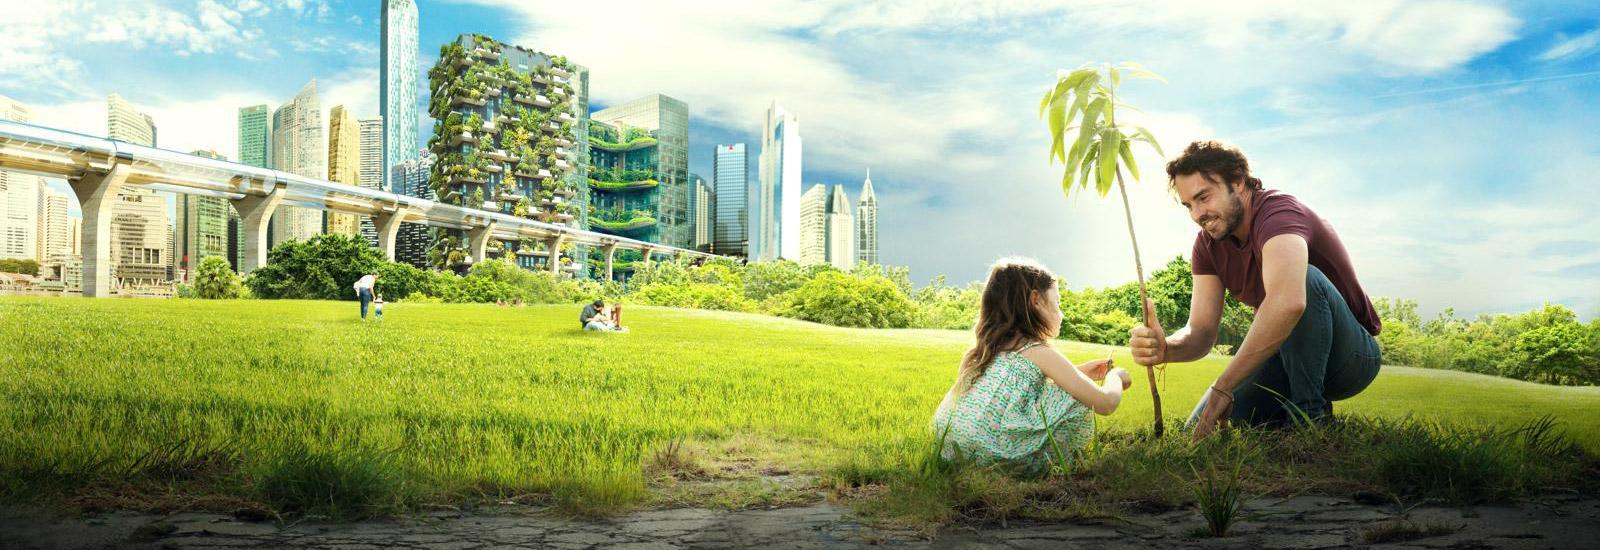 2040 - Salviamo il pianeta!